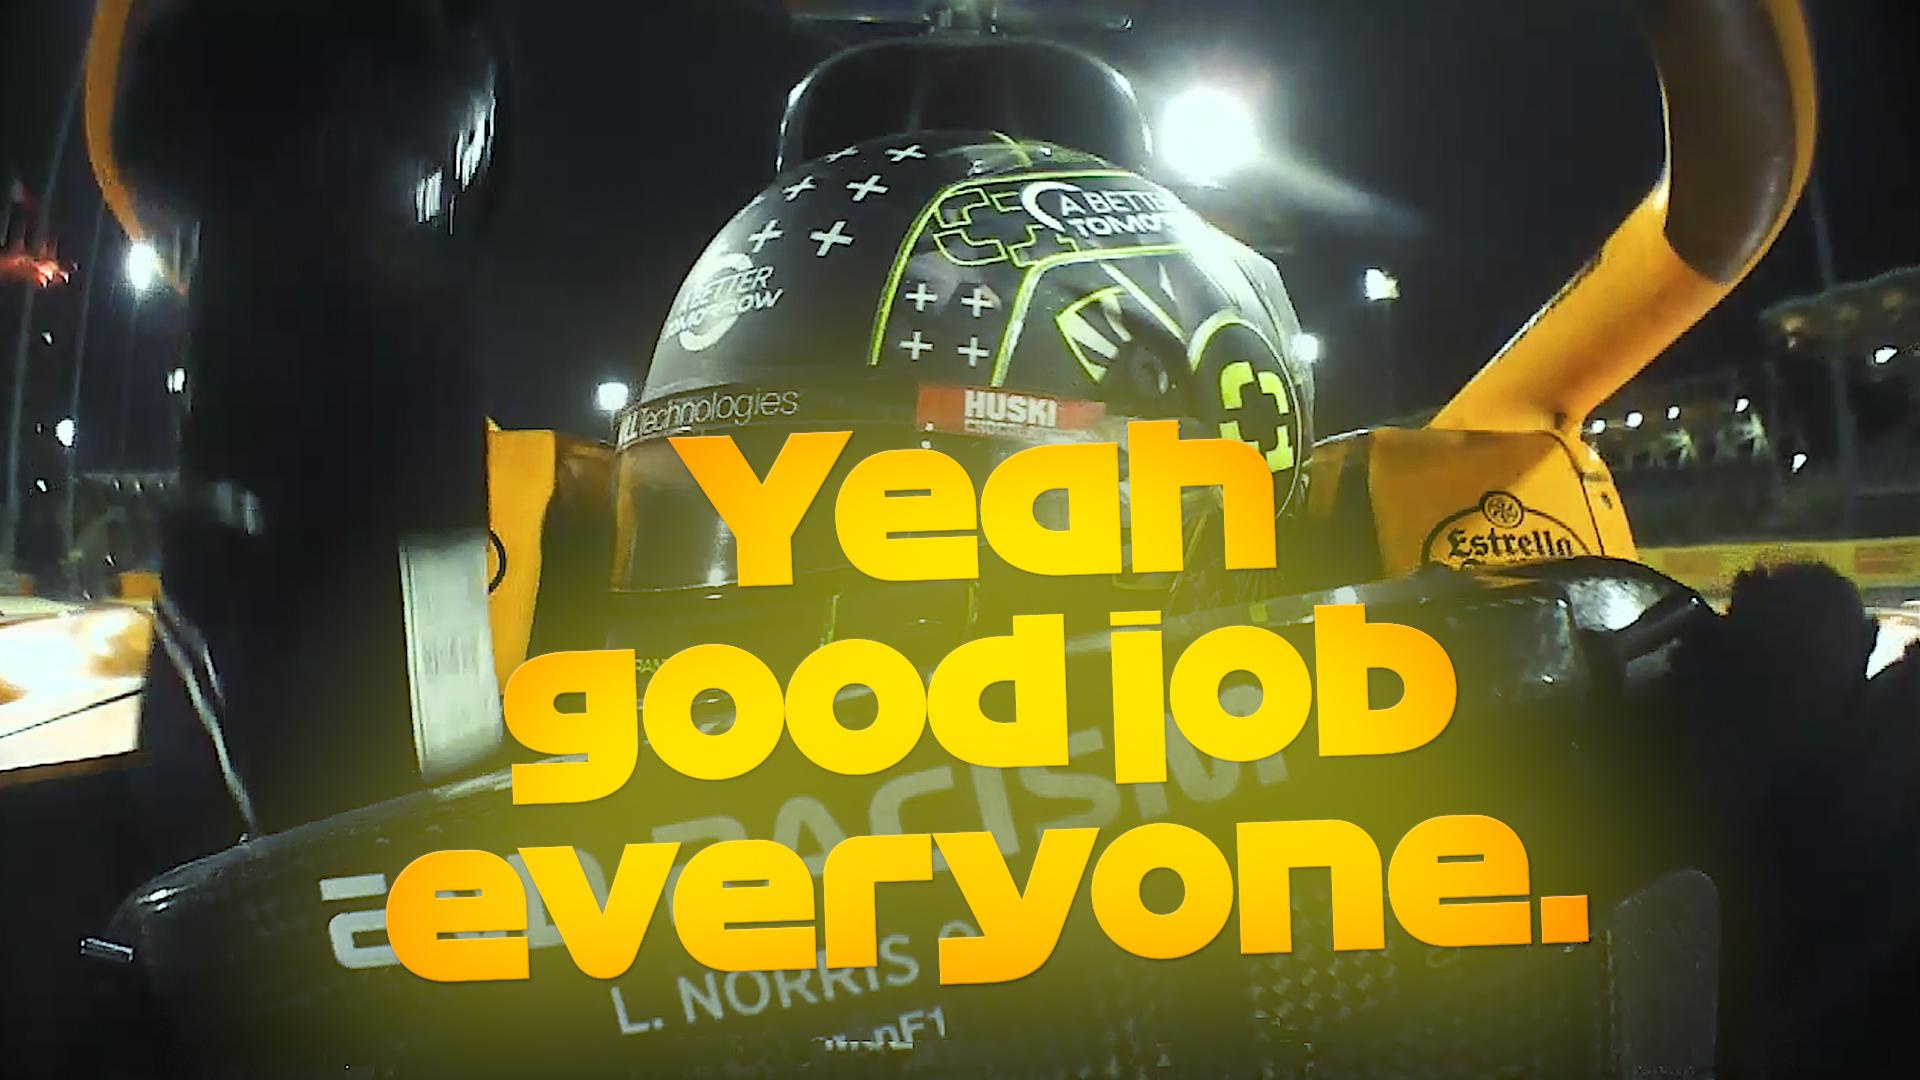 Norris & Sainz celebrate P4 and P5 for McLaren at Bahrain GP